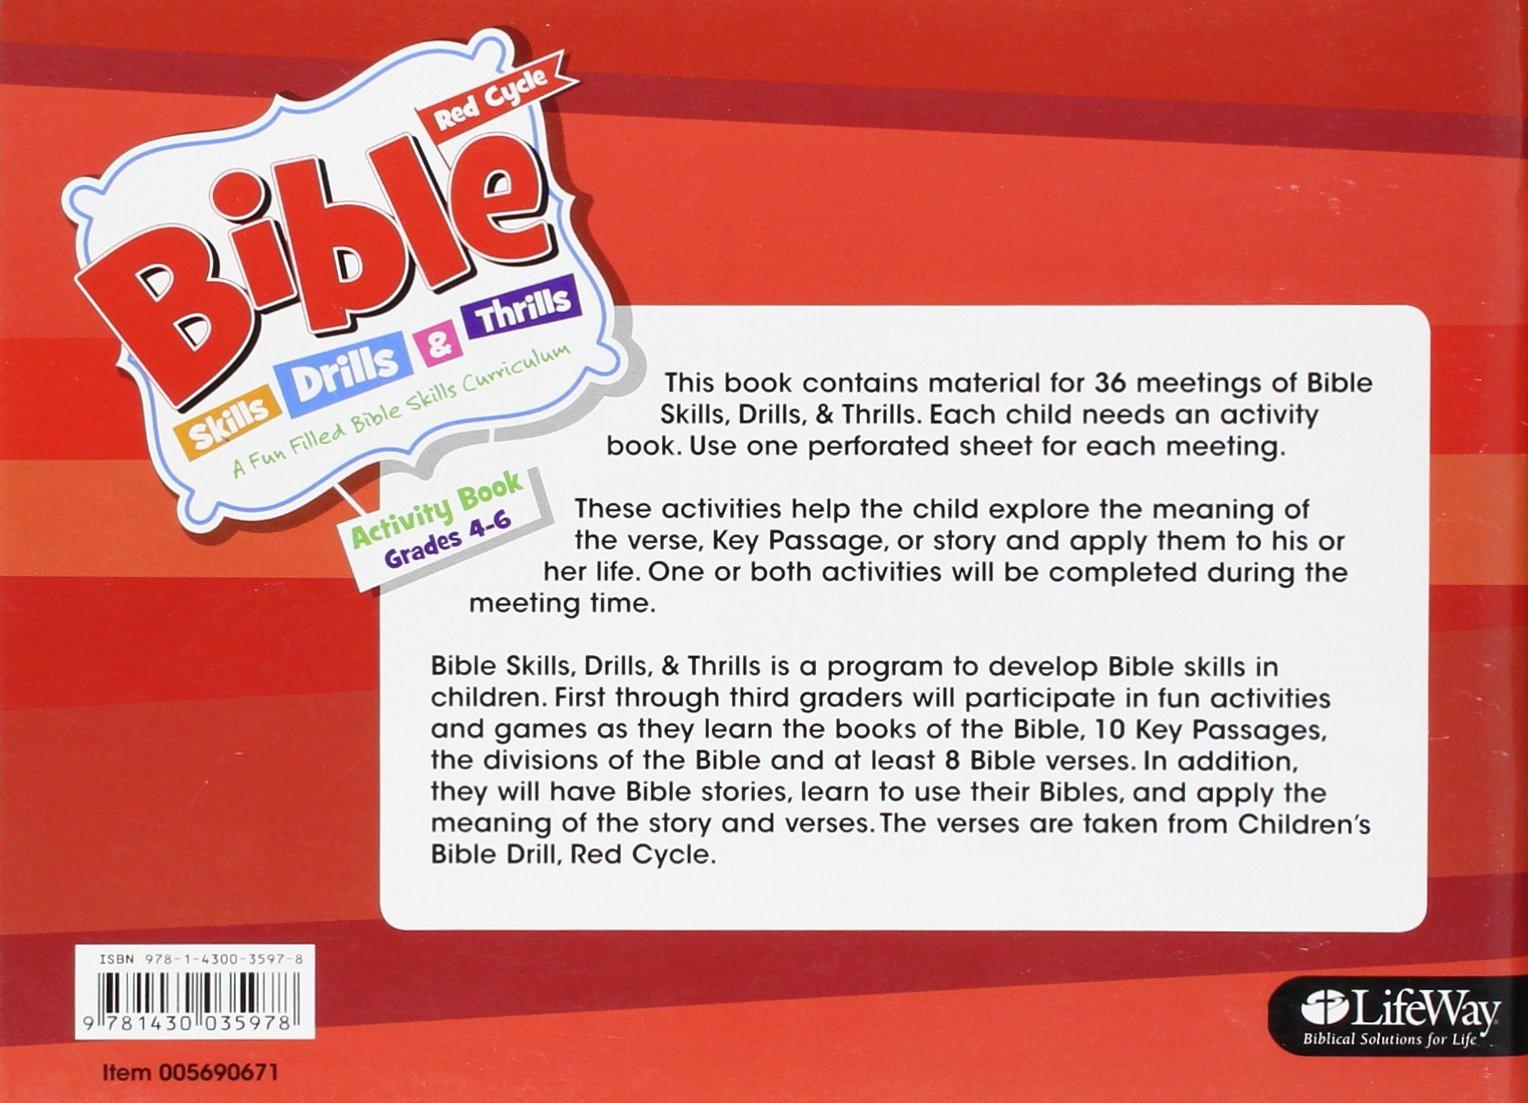 bible skills drills u0026 thrills red cycle grades 4 6 activity